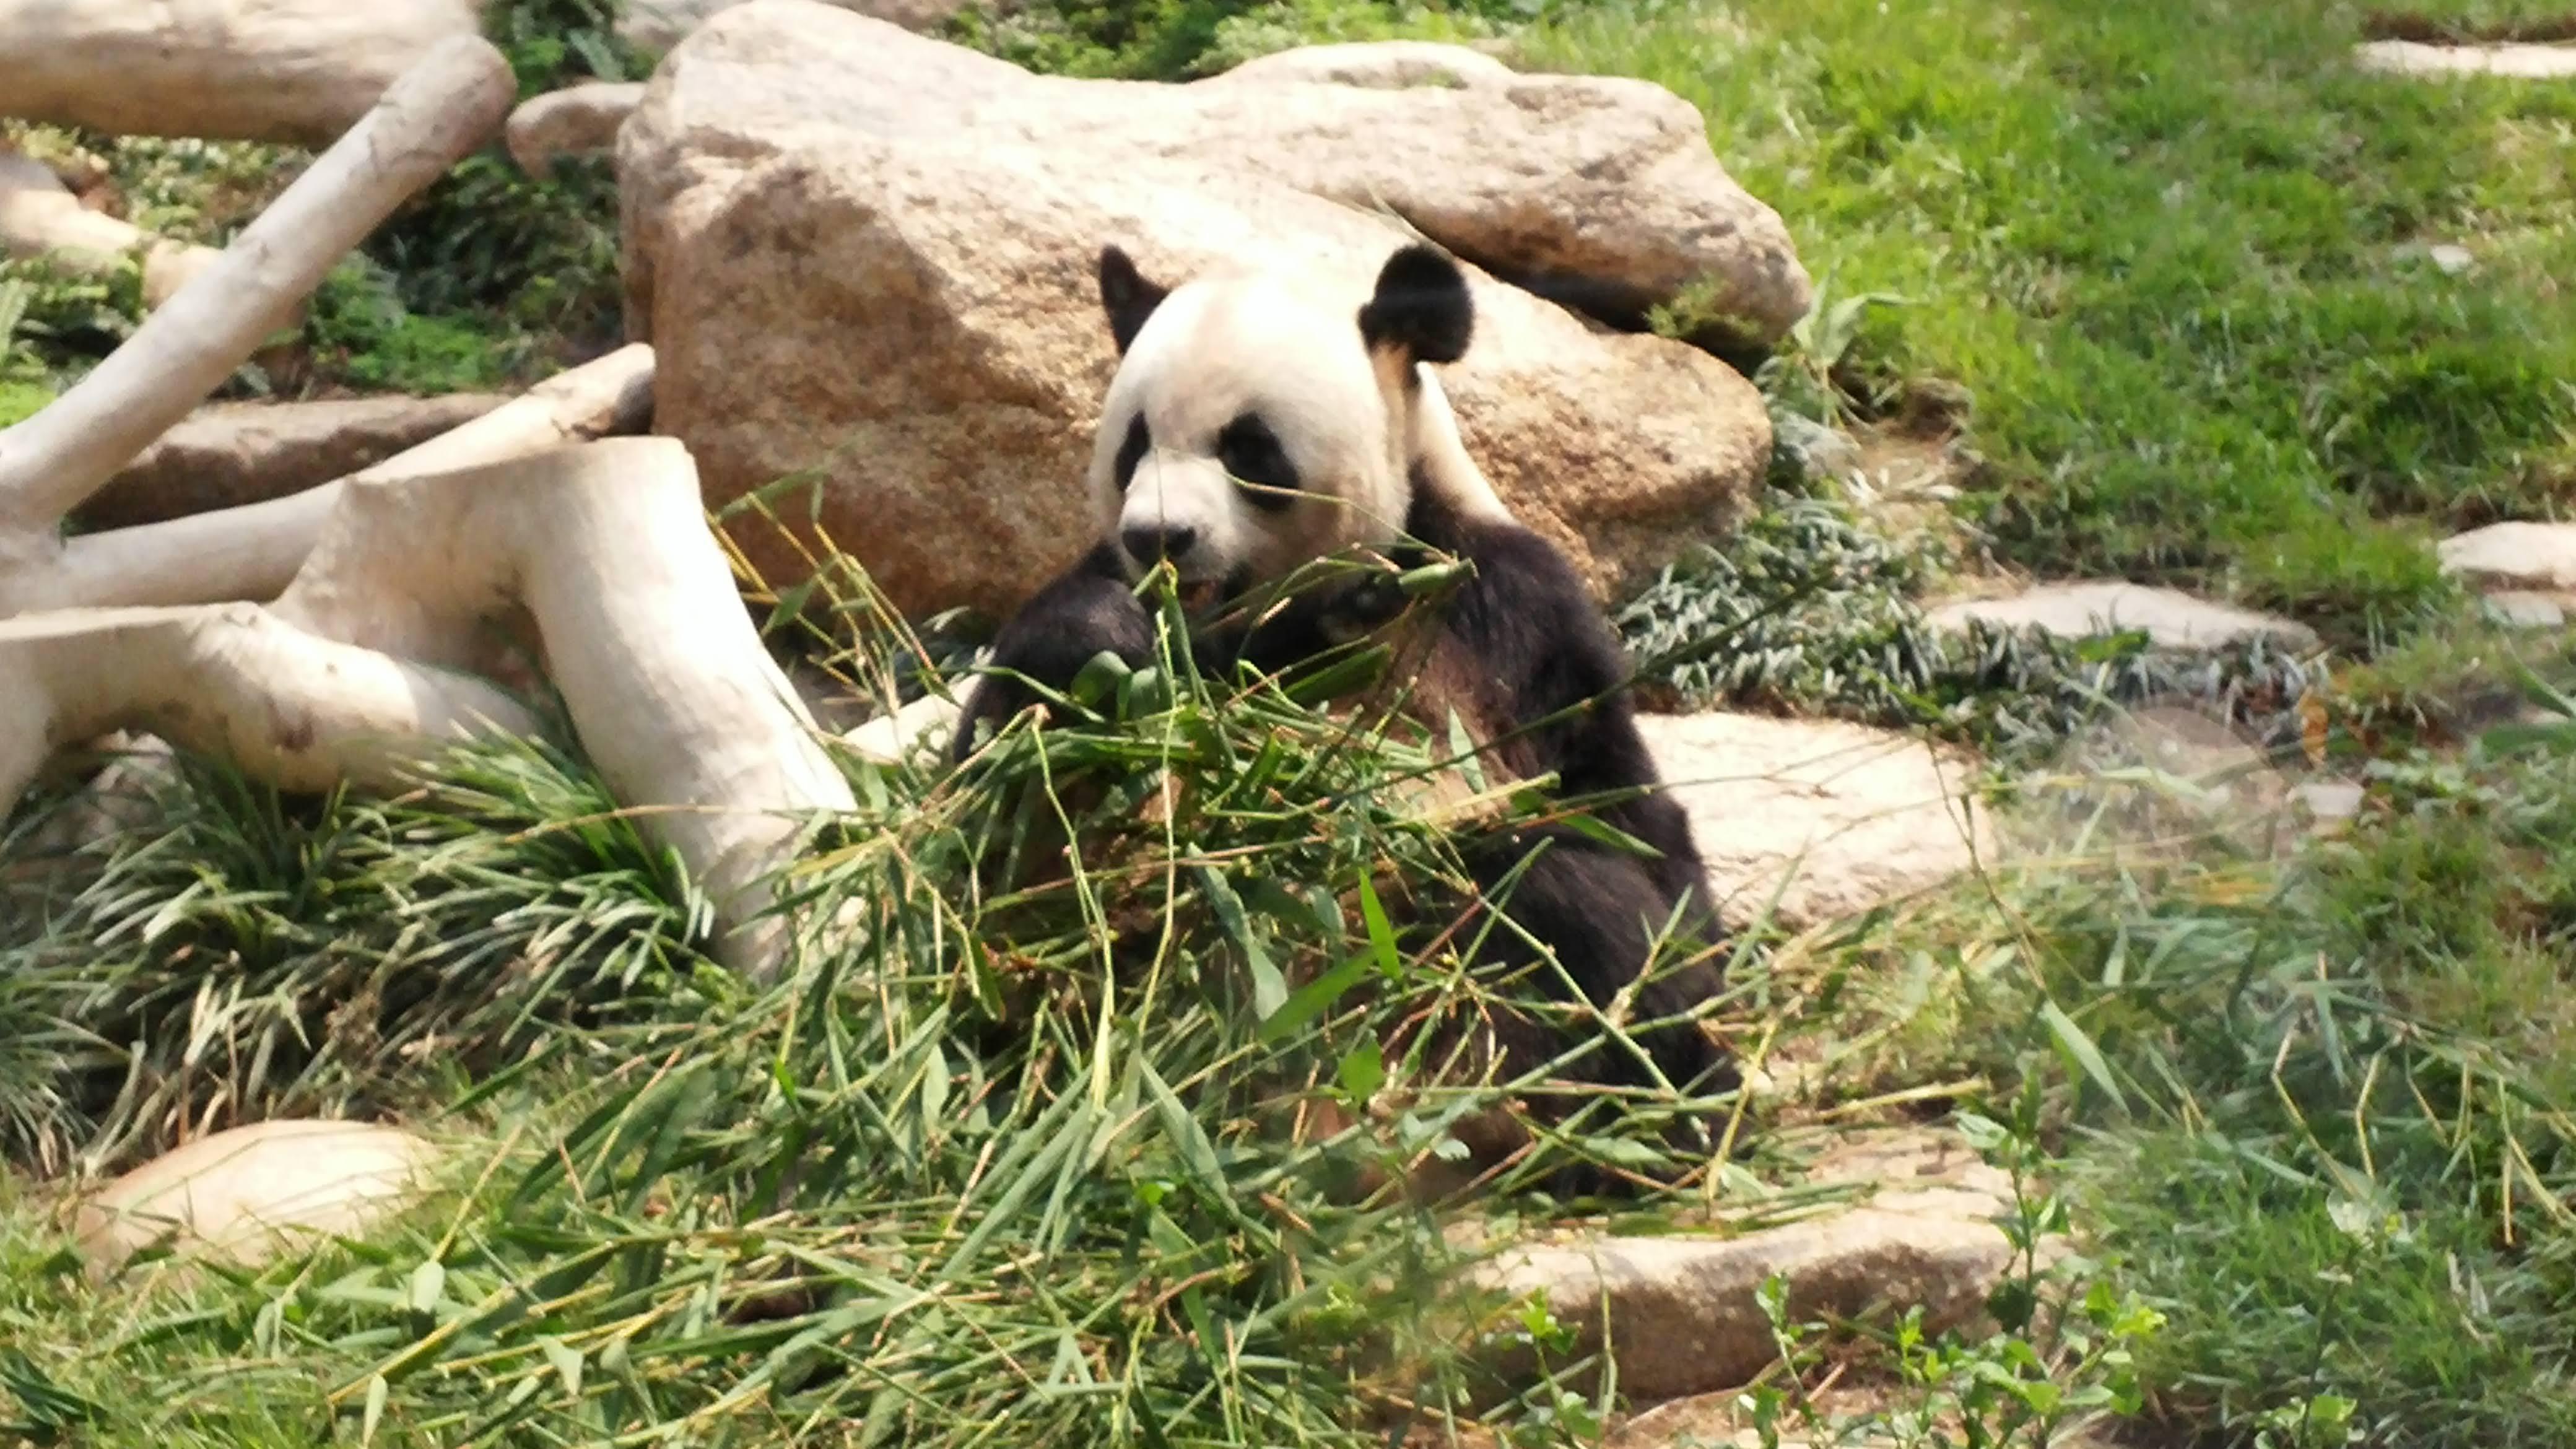 Macau Panda eating bamboo in the morning